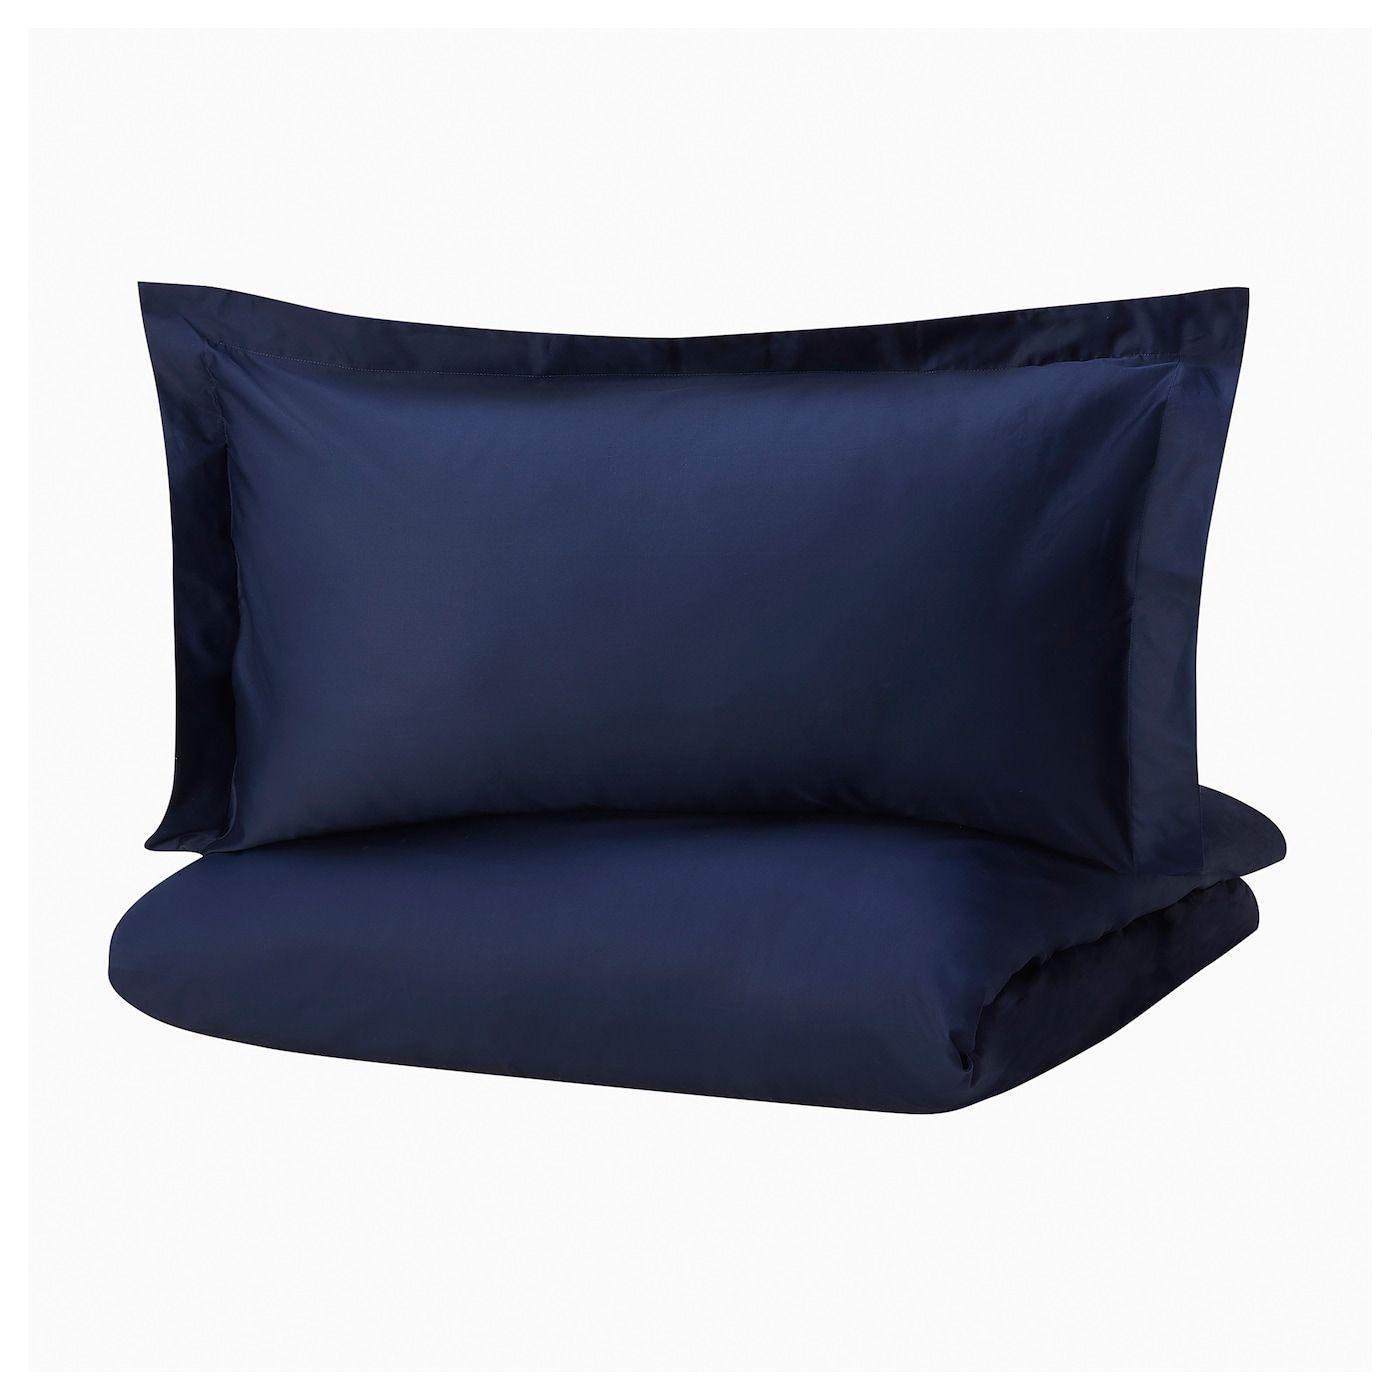 Ikea Finnskrappa Housse De Couette Et Taie S Bleu Fonce Housse De Couette Housse De Couette Ikea Draps Bleu